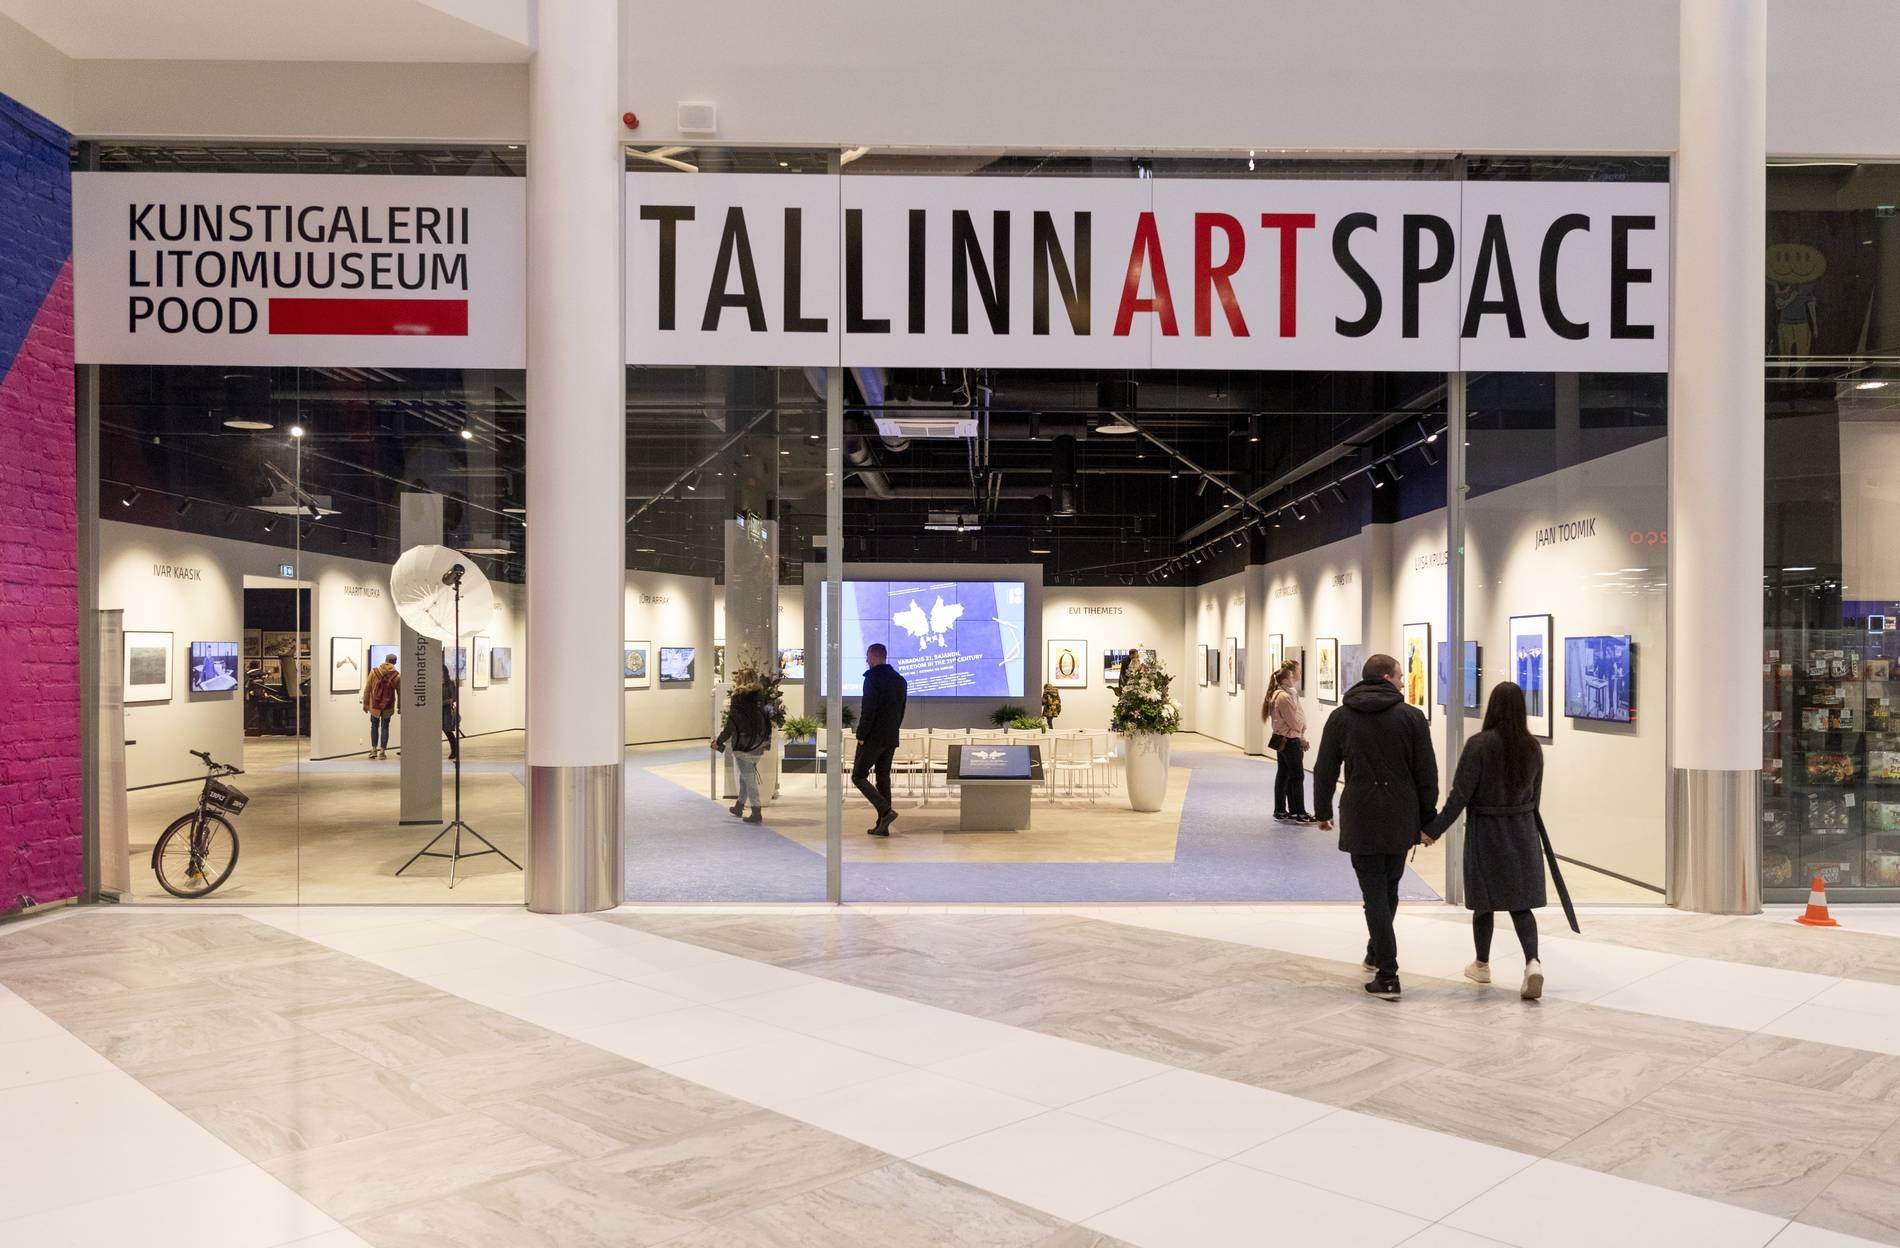 Tallinn Art Space